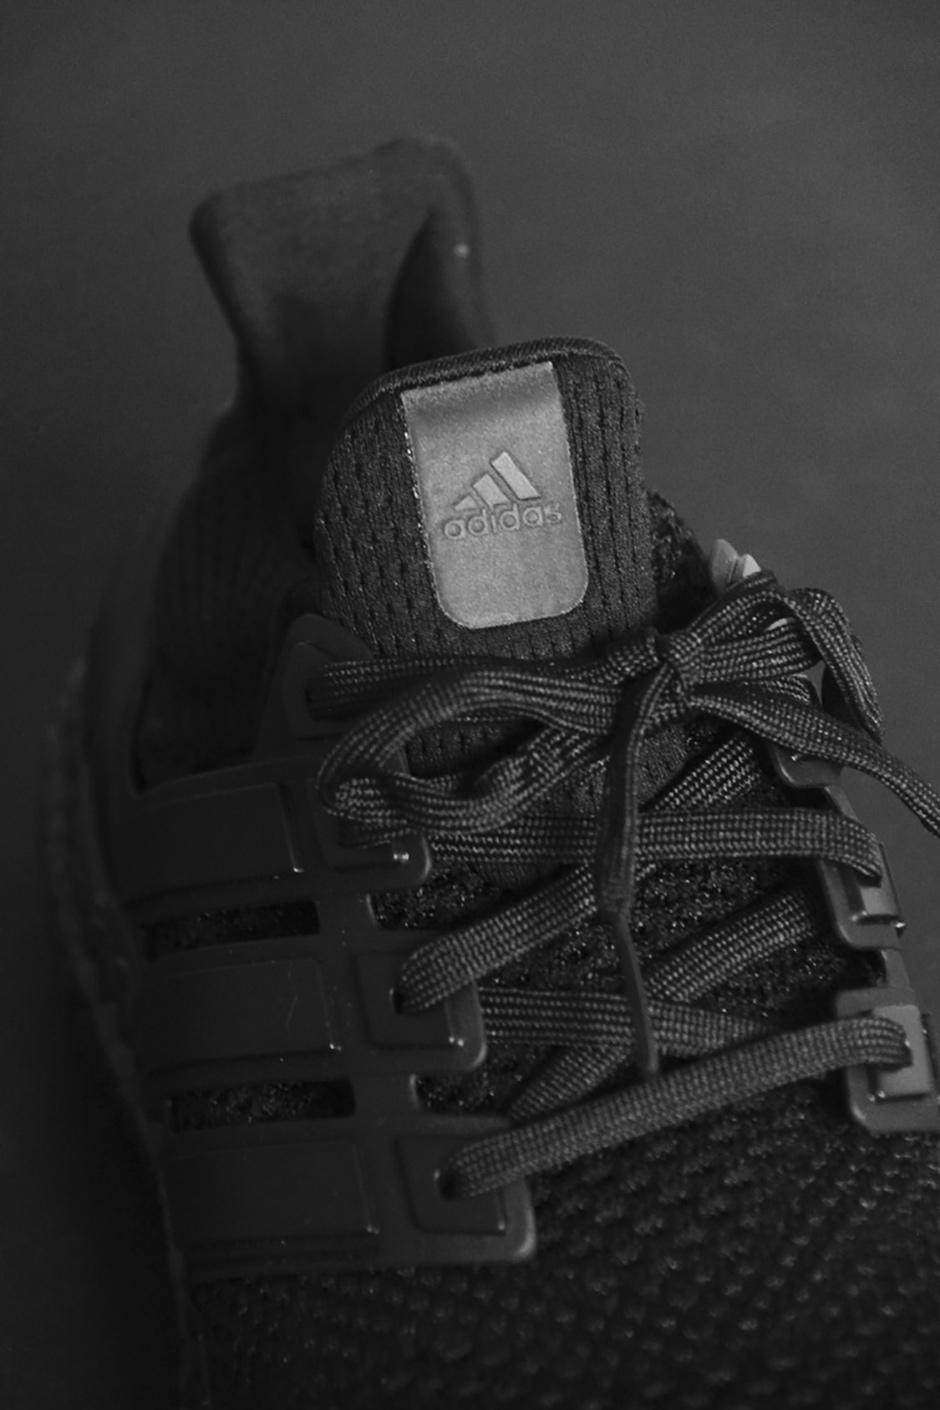 Adidas De Ultra Impulso De Triple Negro 1.0 Para La Venta N7Qfc4Pbm